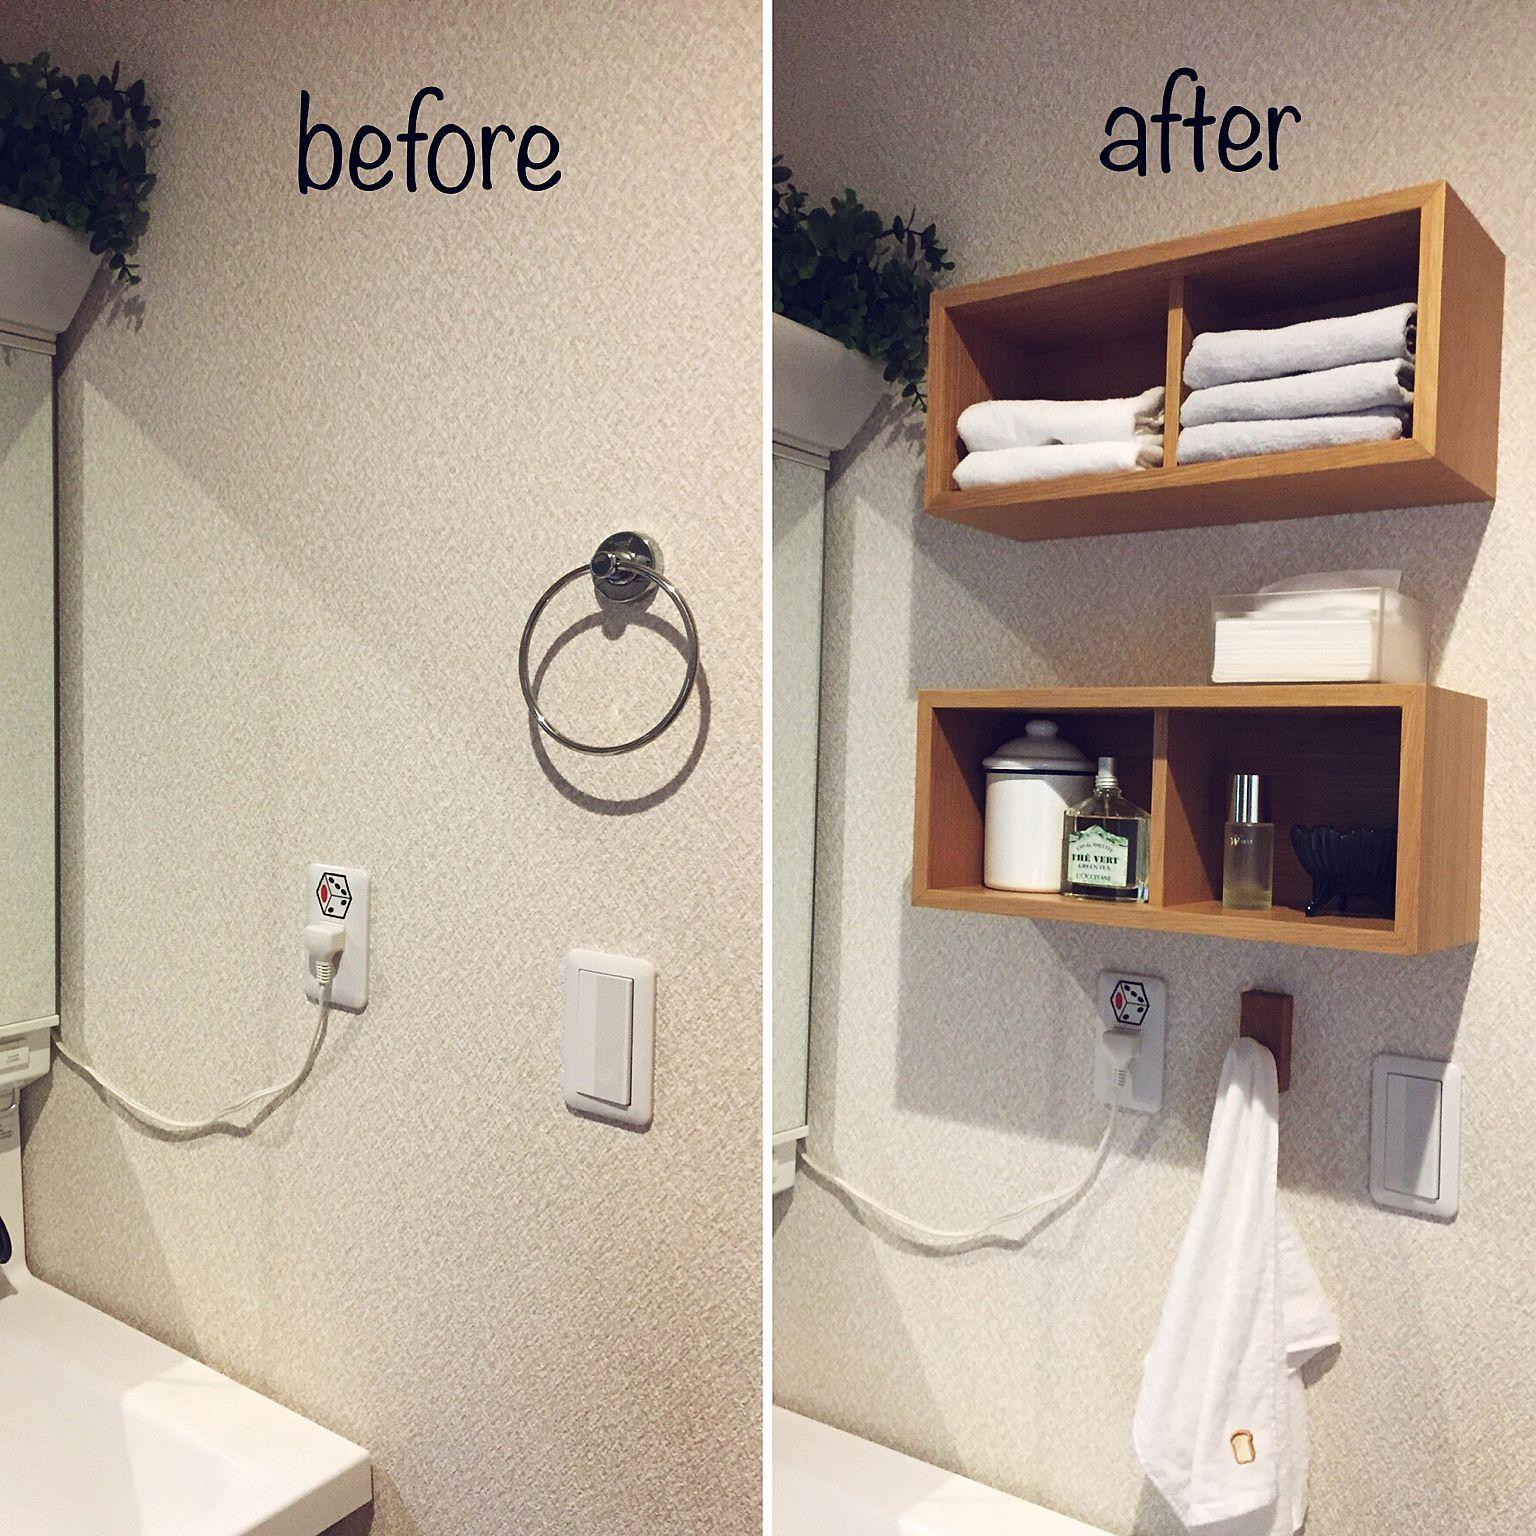 Bathroom タオル収納 タオルハンガー 壁につけられる家具 ニトリ など